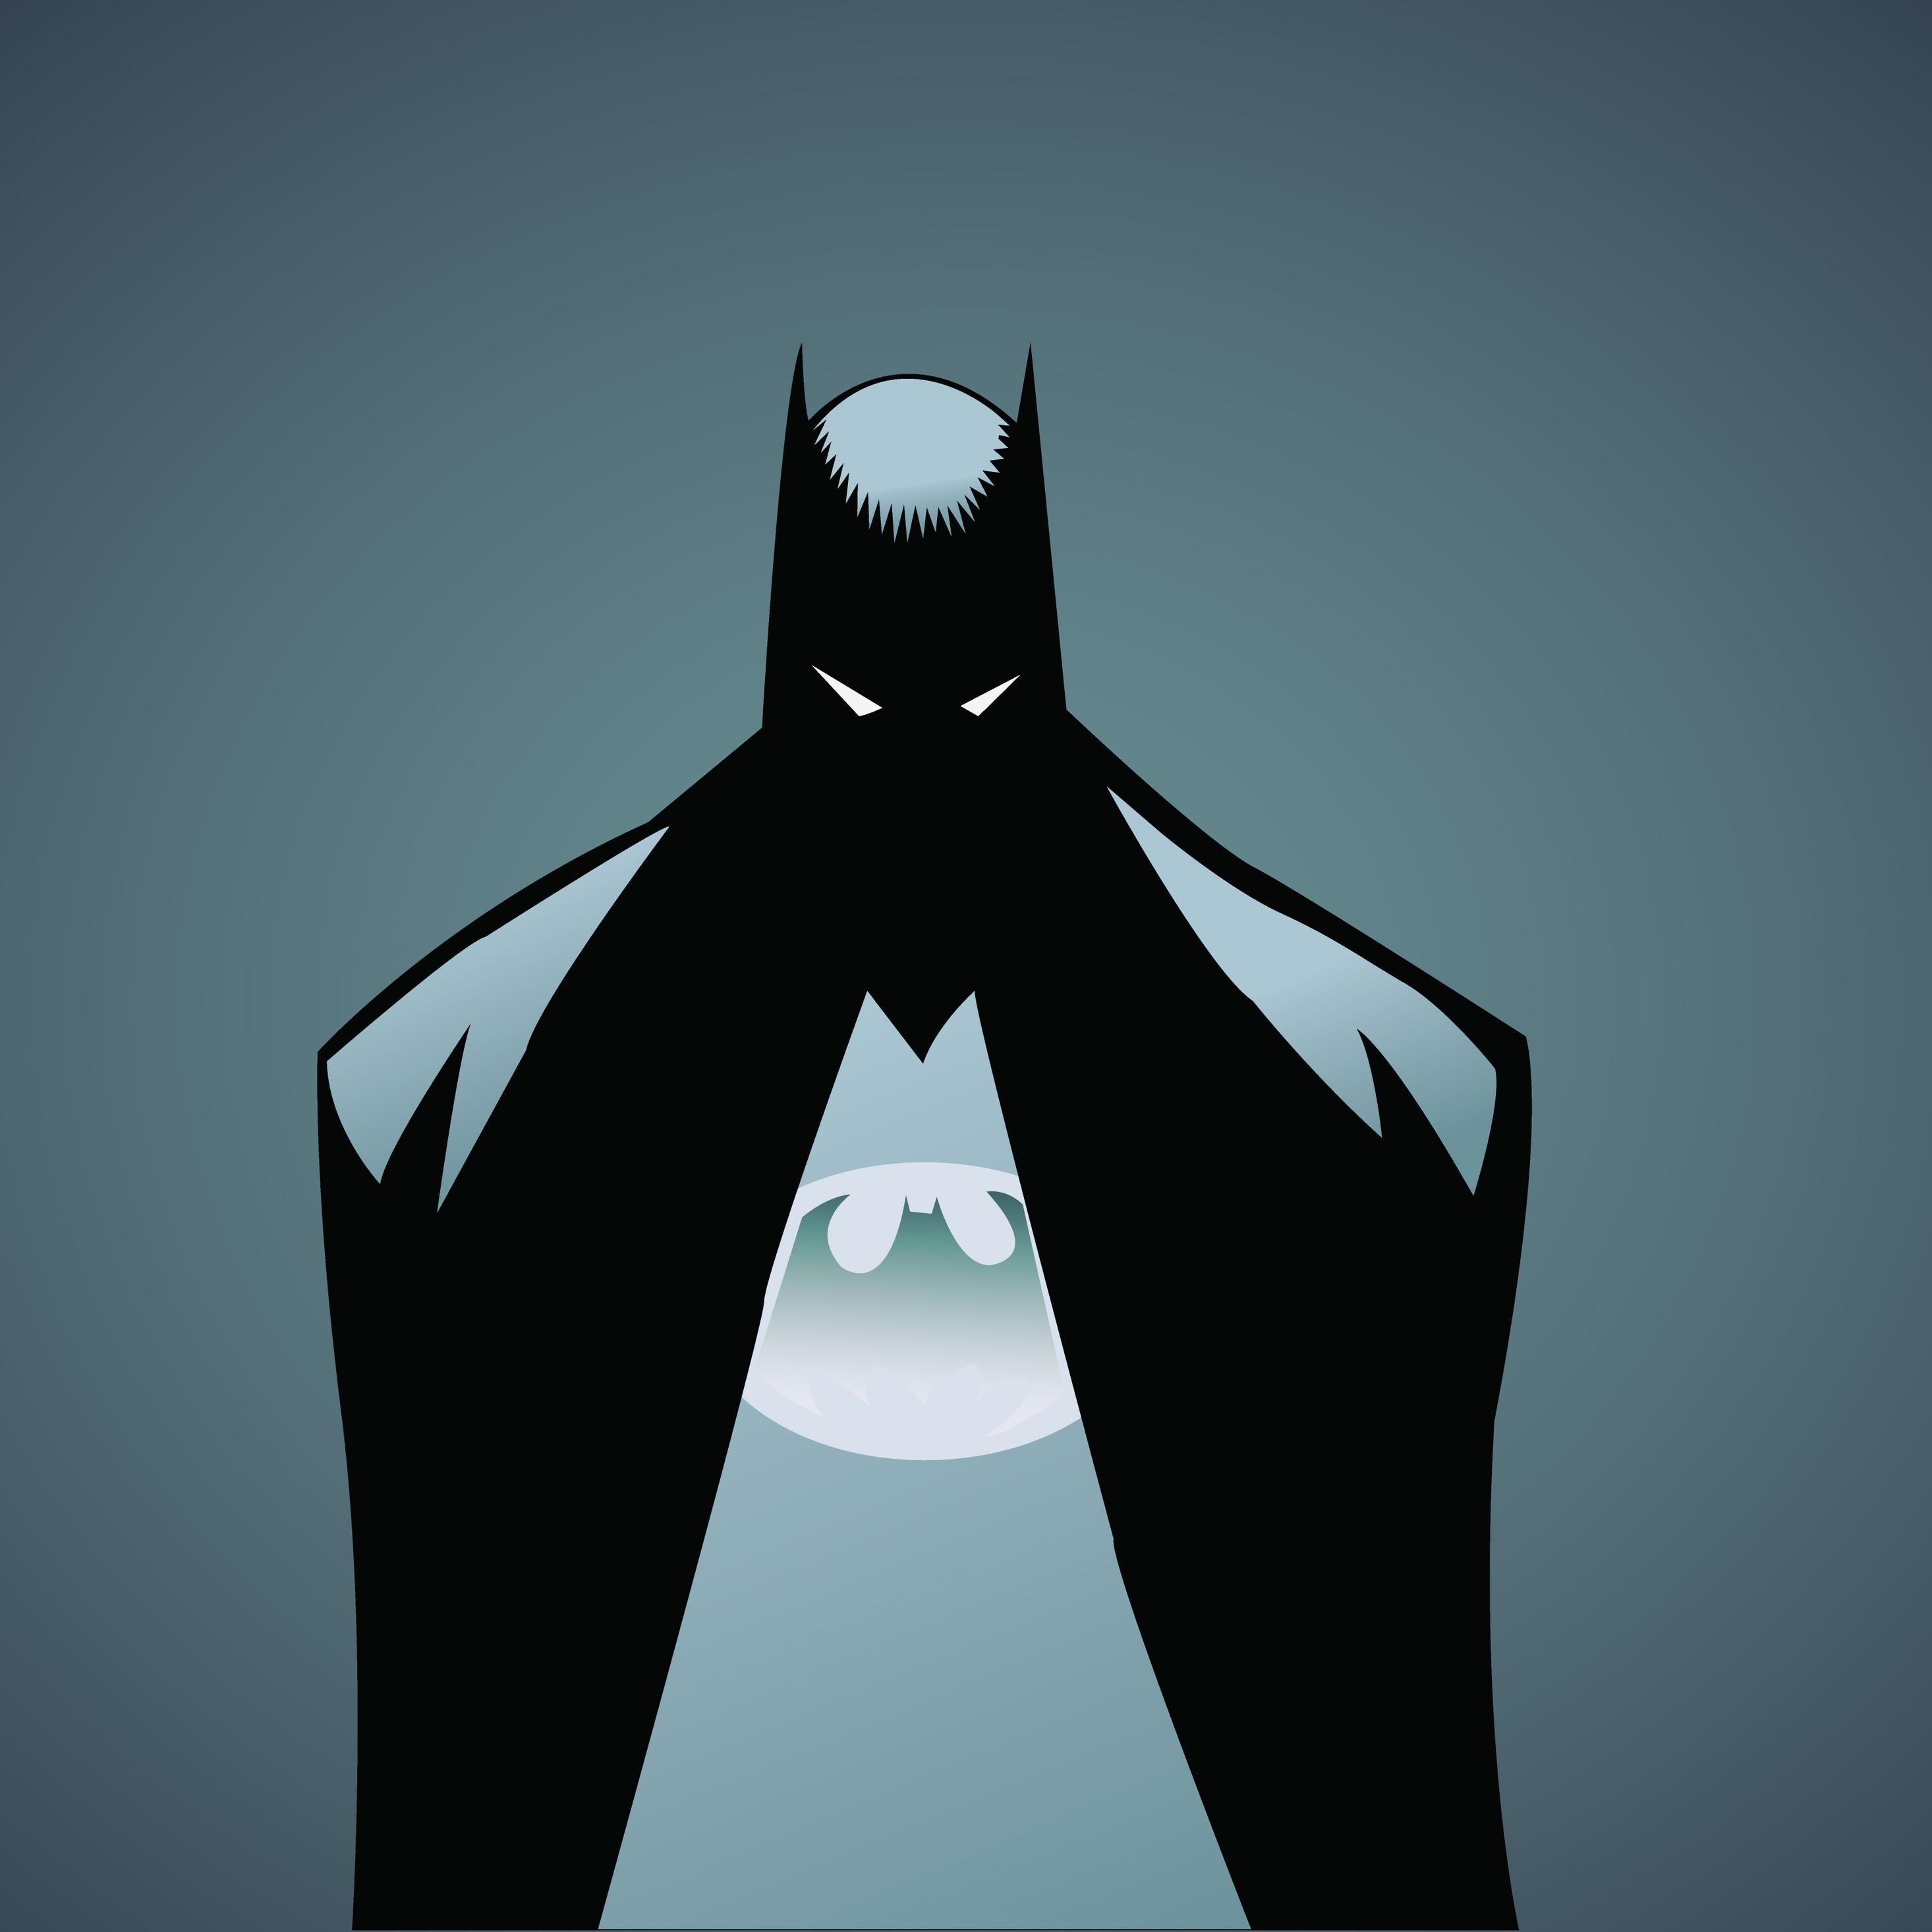 batman-minimalism-illustrator-5k-0z.jpg